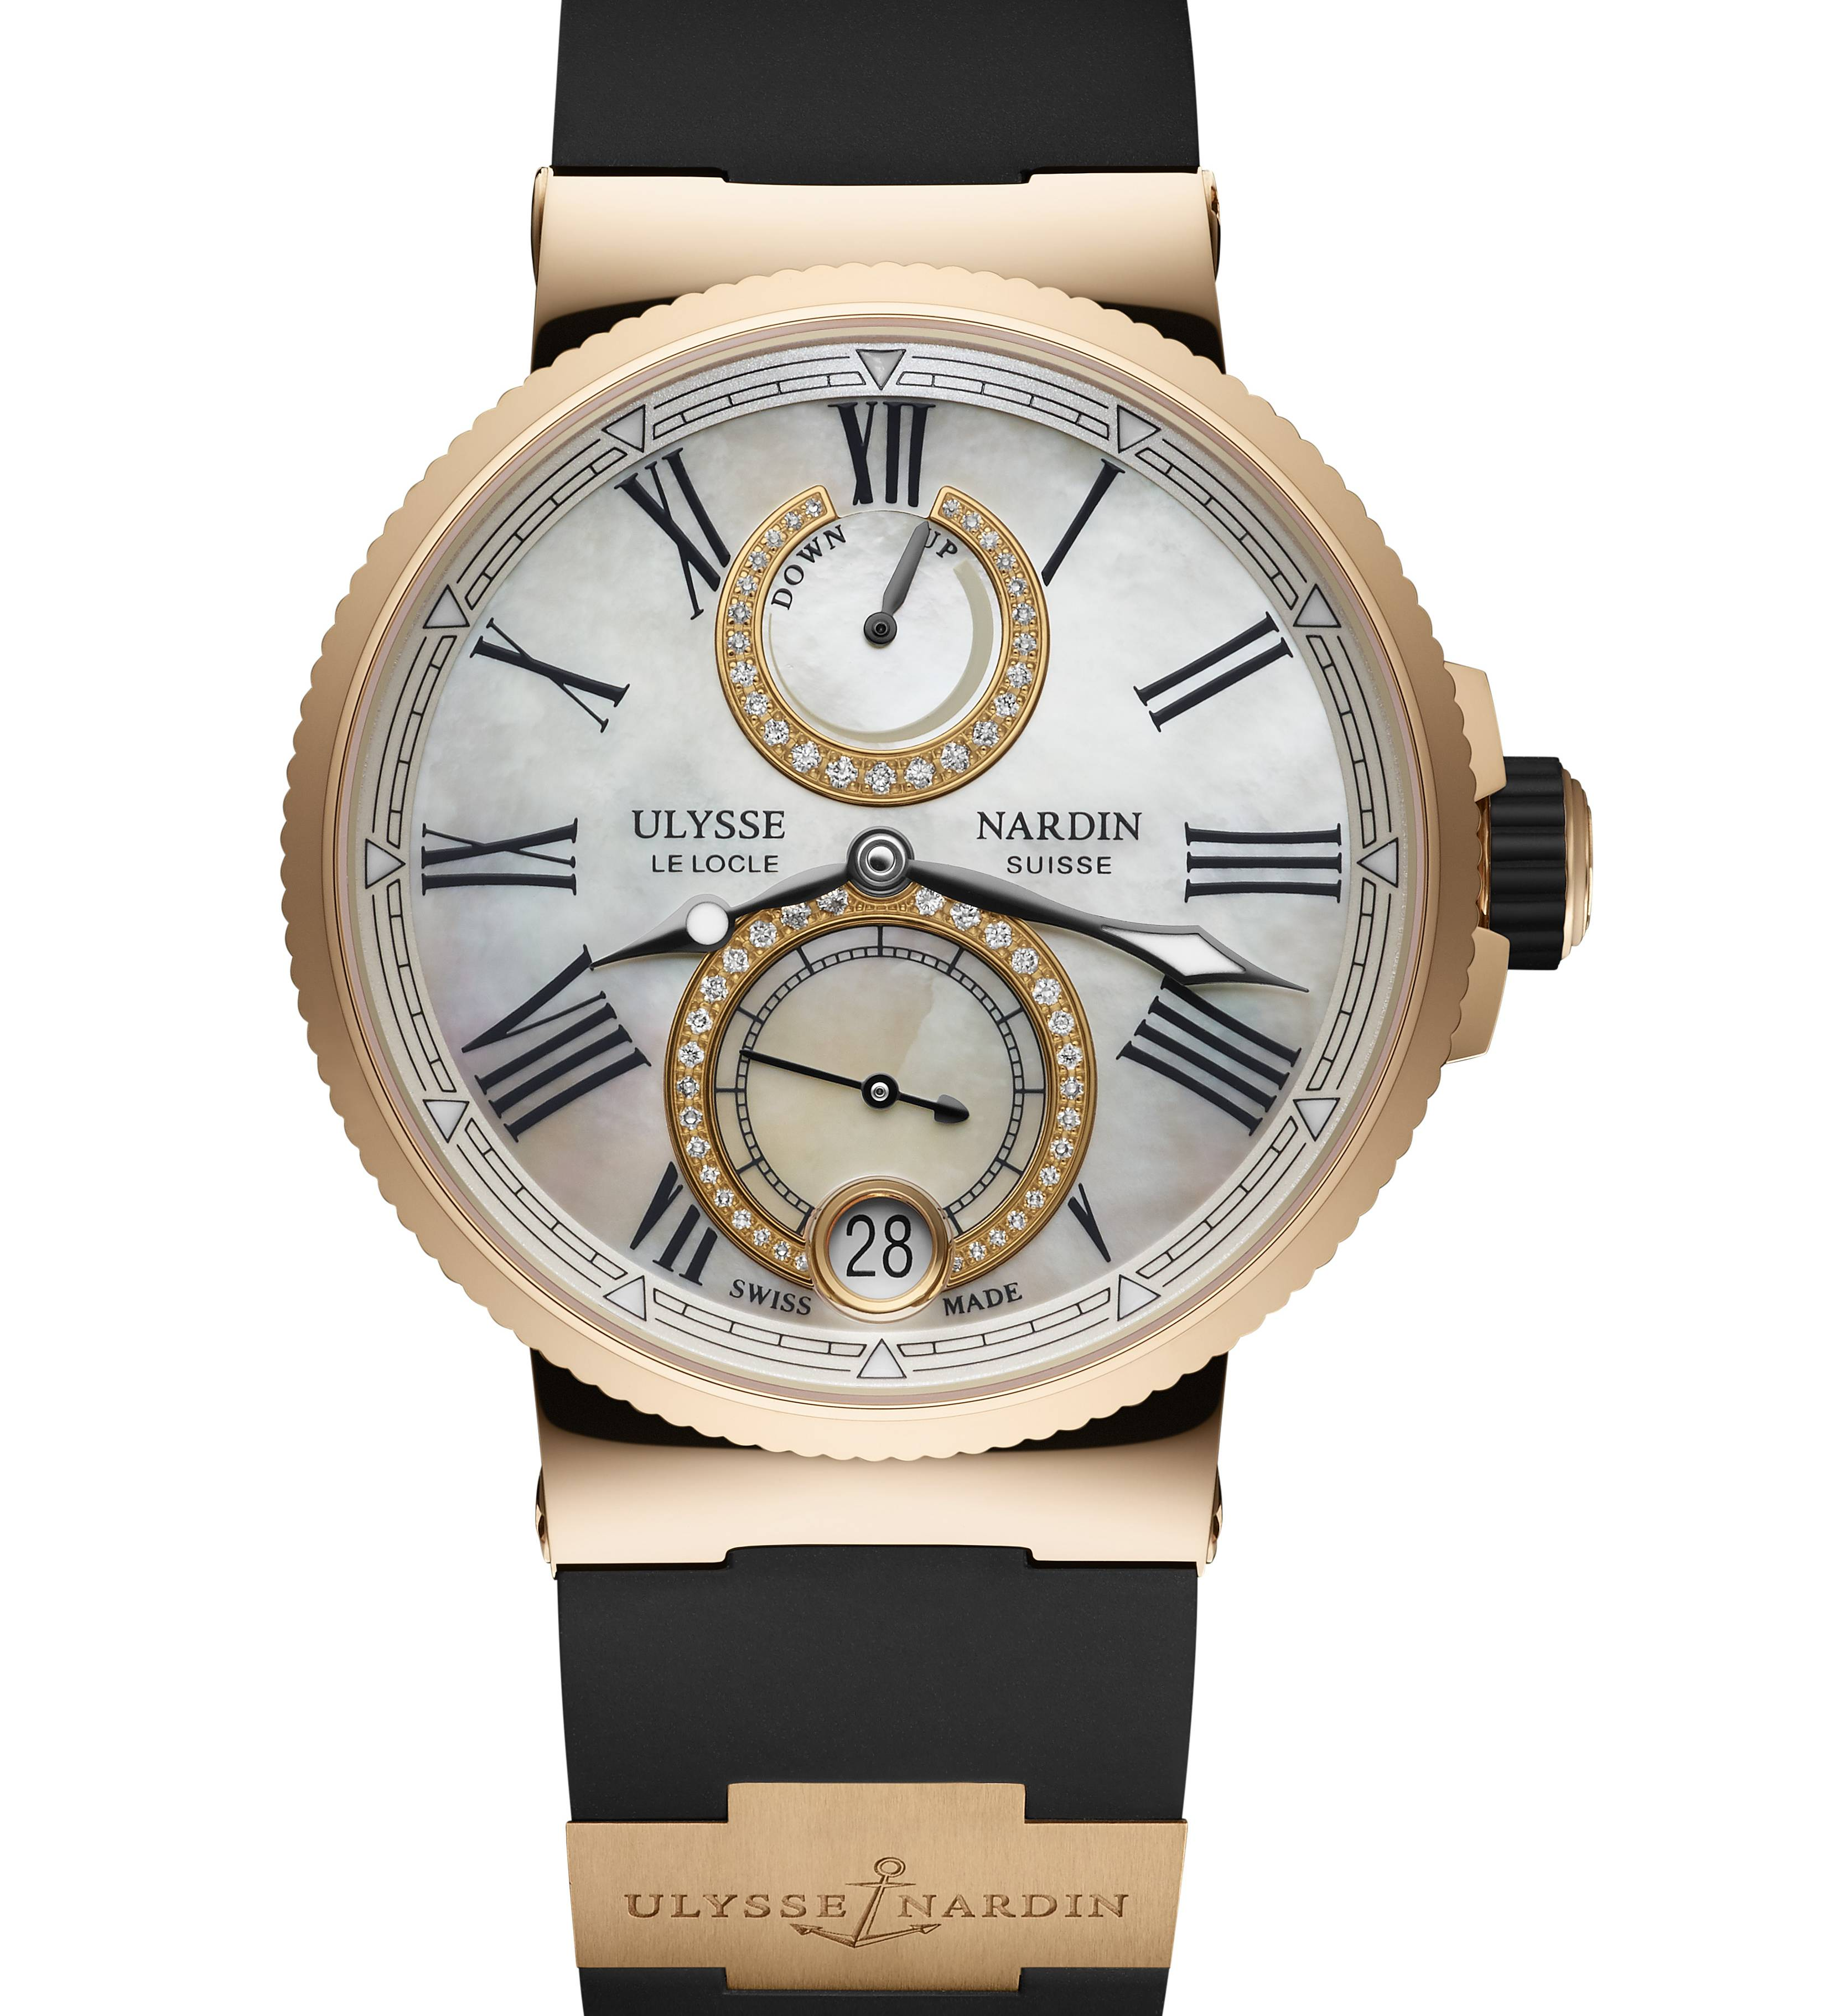 Ulysse Nardin Lady Marine Chronometer cadran nacre